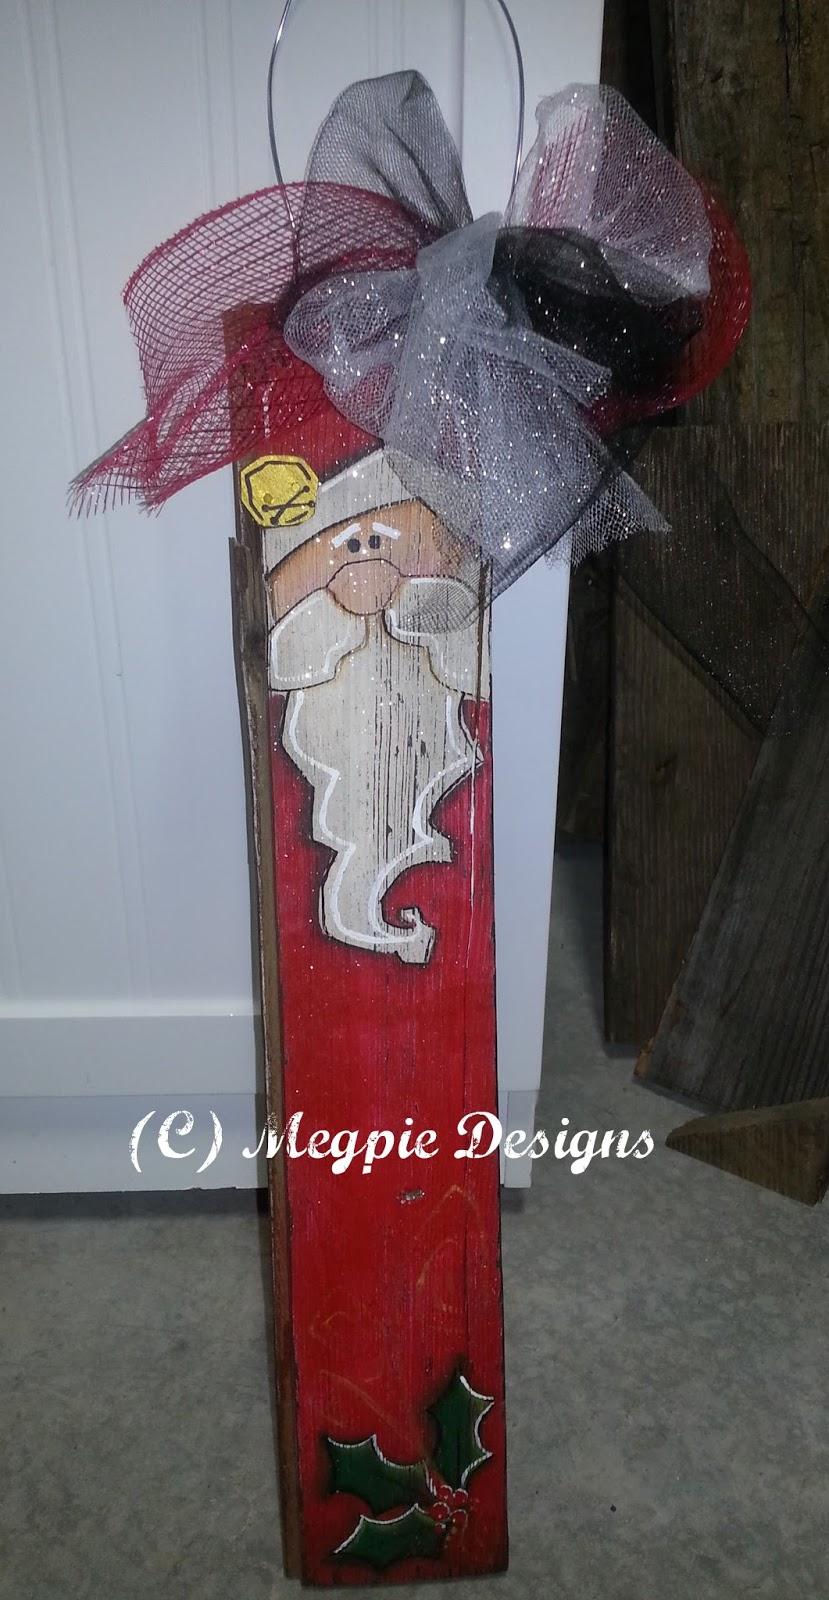 Megpie designs barn wood santa dcc blog hop for Wood craft painting ideas